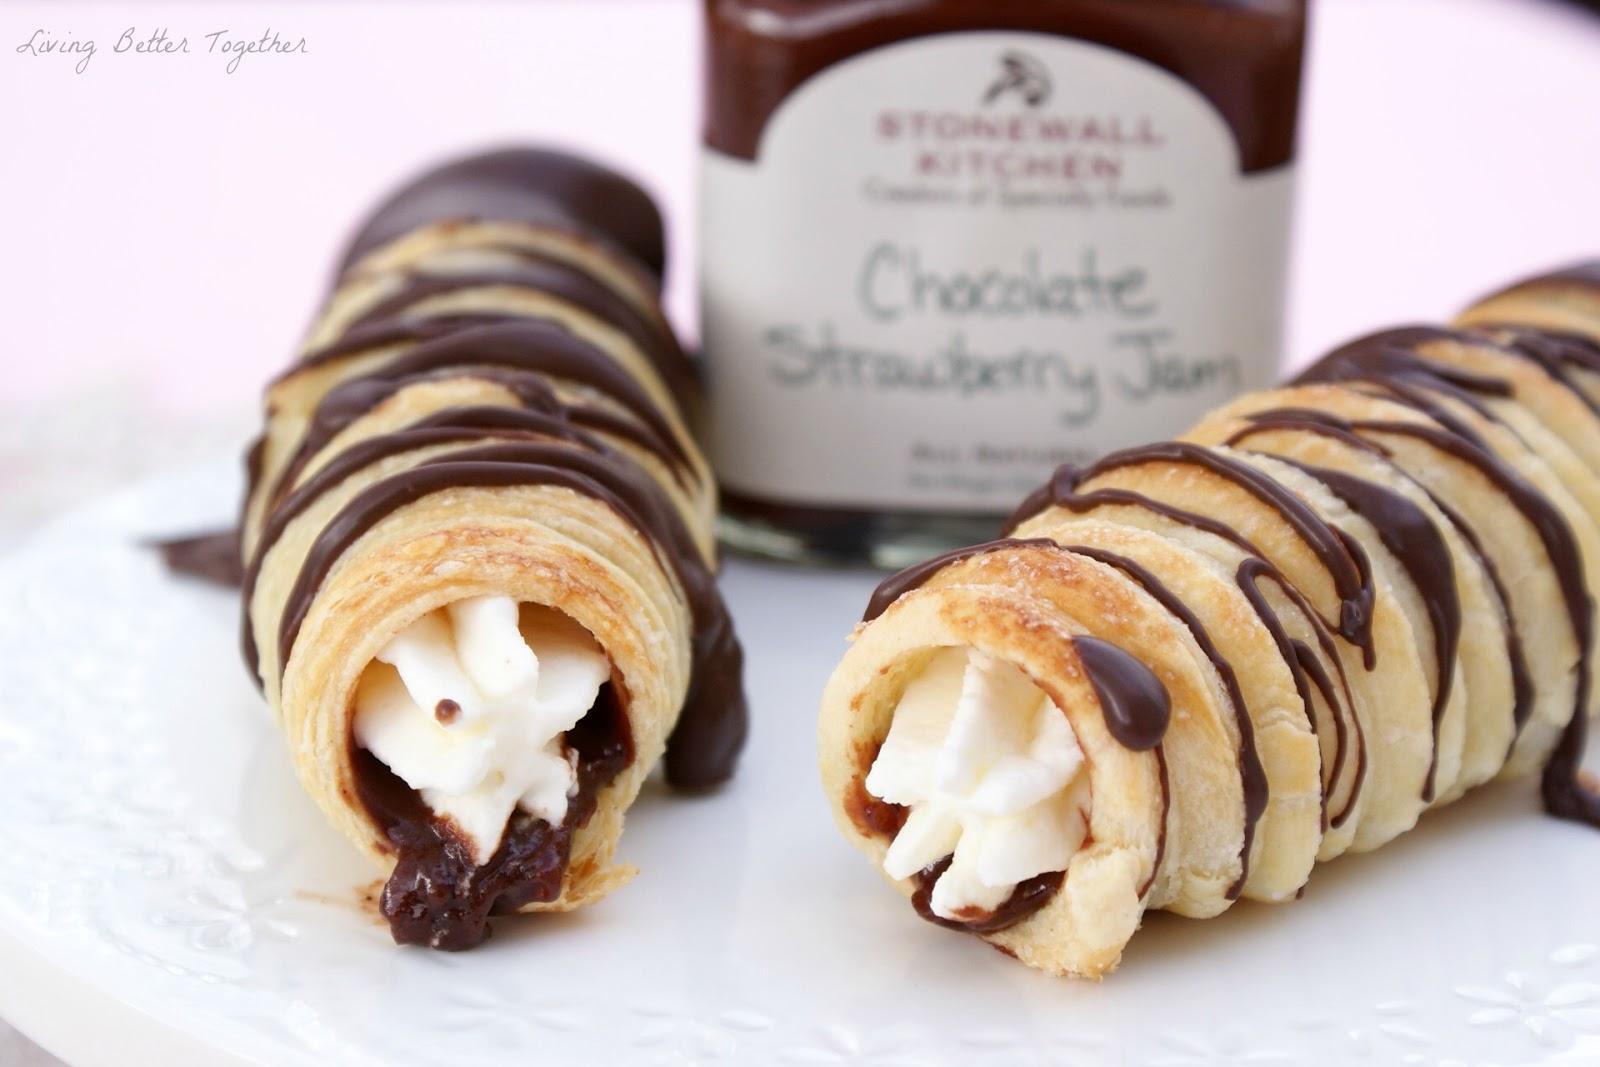 Stonewall Kitchen Dark Chocolate Sea Salt Caramel Sauce Outdoor Countertops Strawberry Cream Horns - Living Better Together